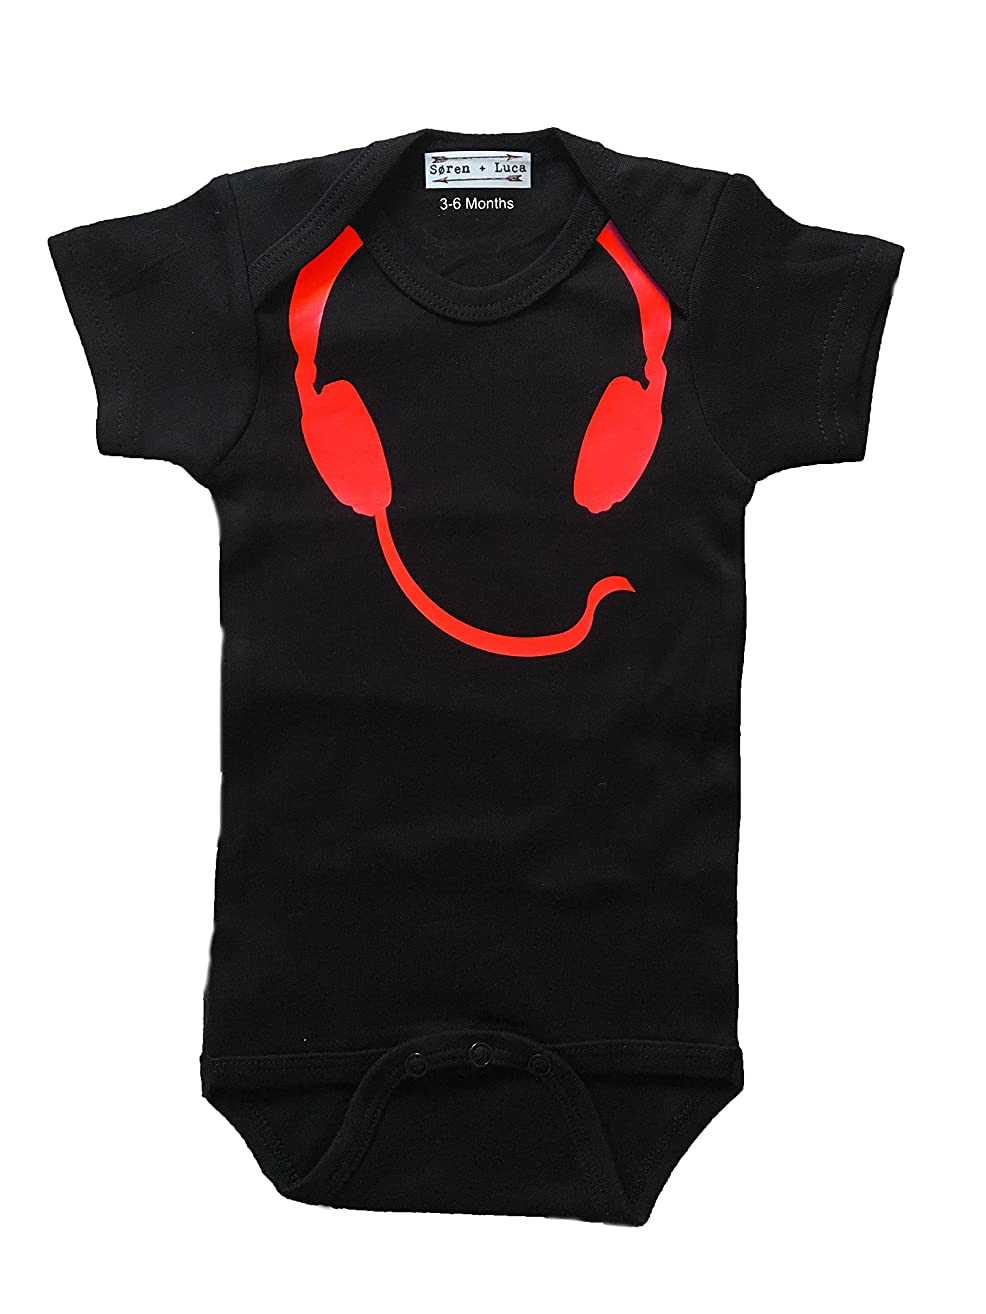 Toddler Headphones Bodysuit And Tee Shirt